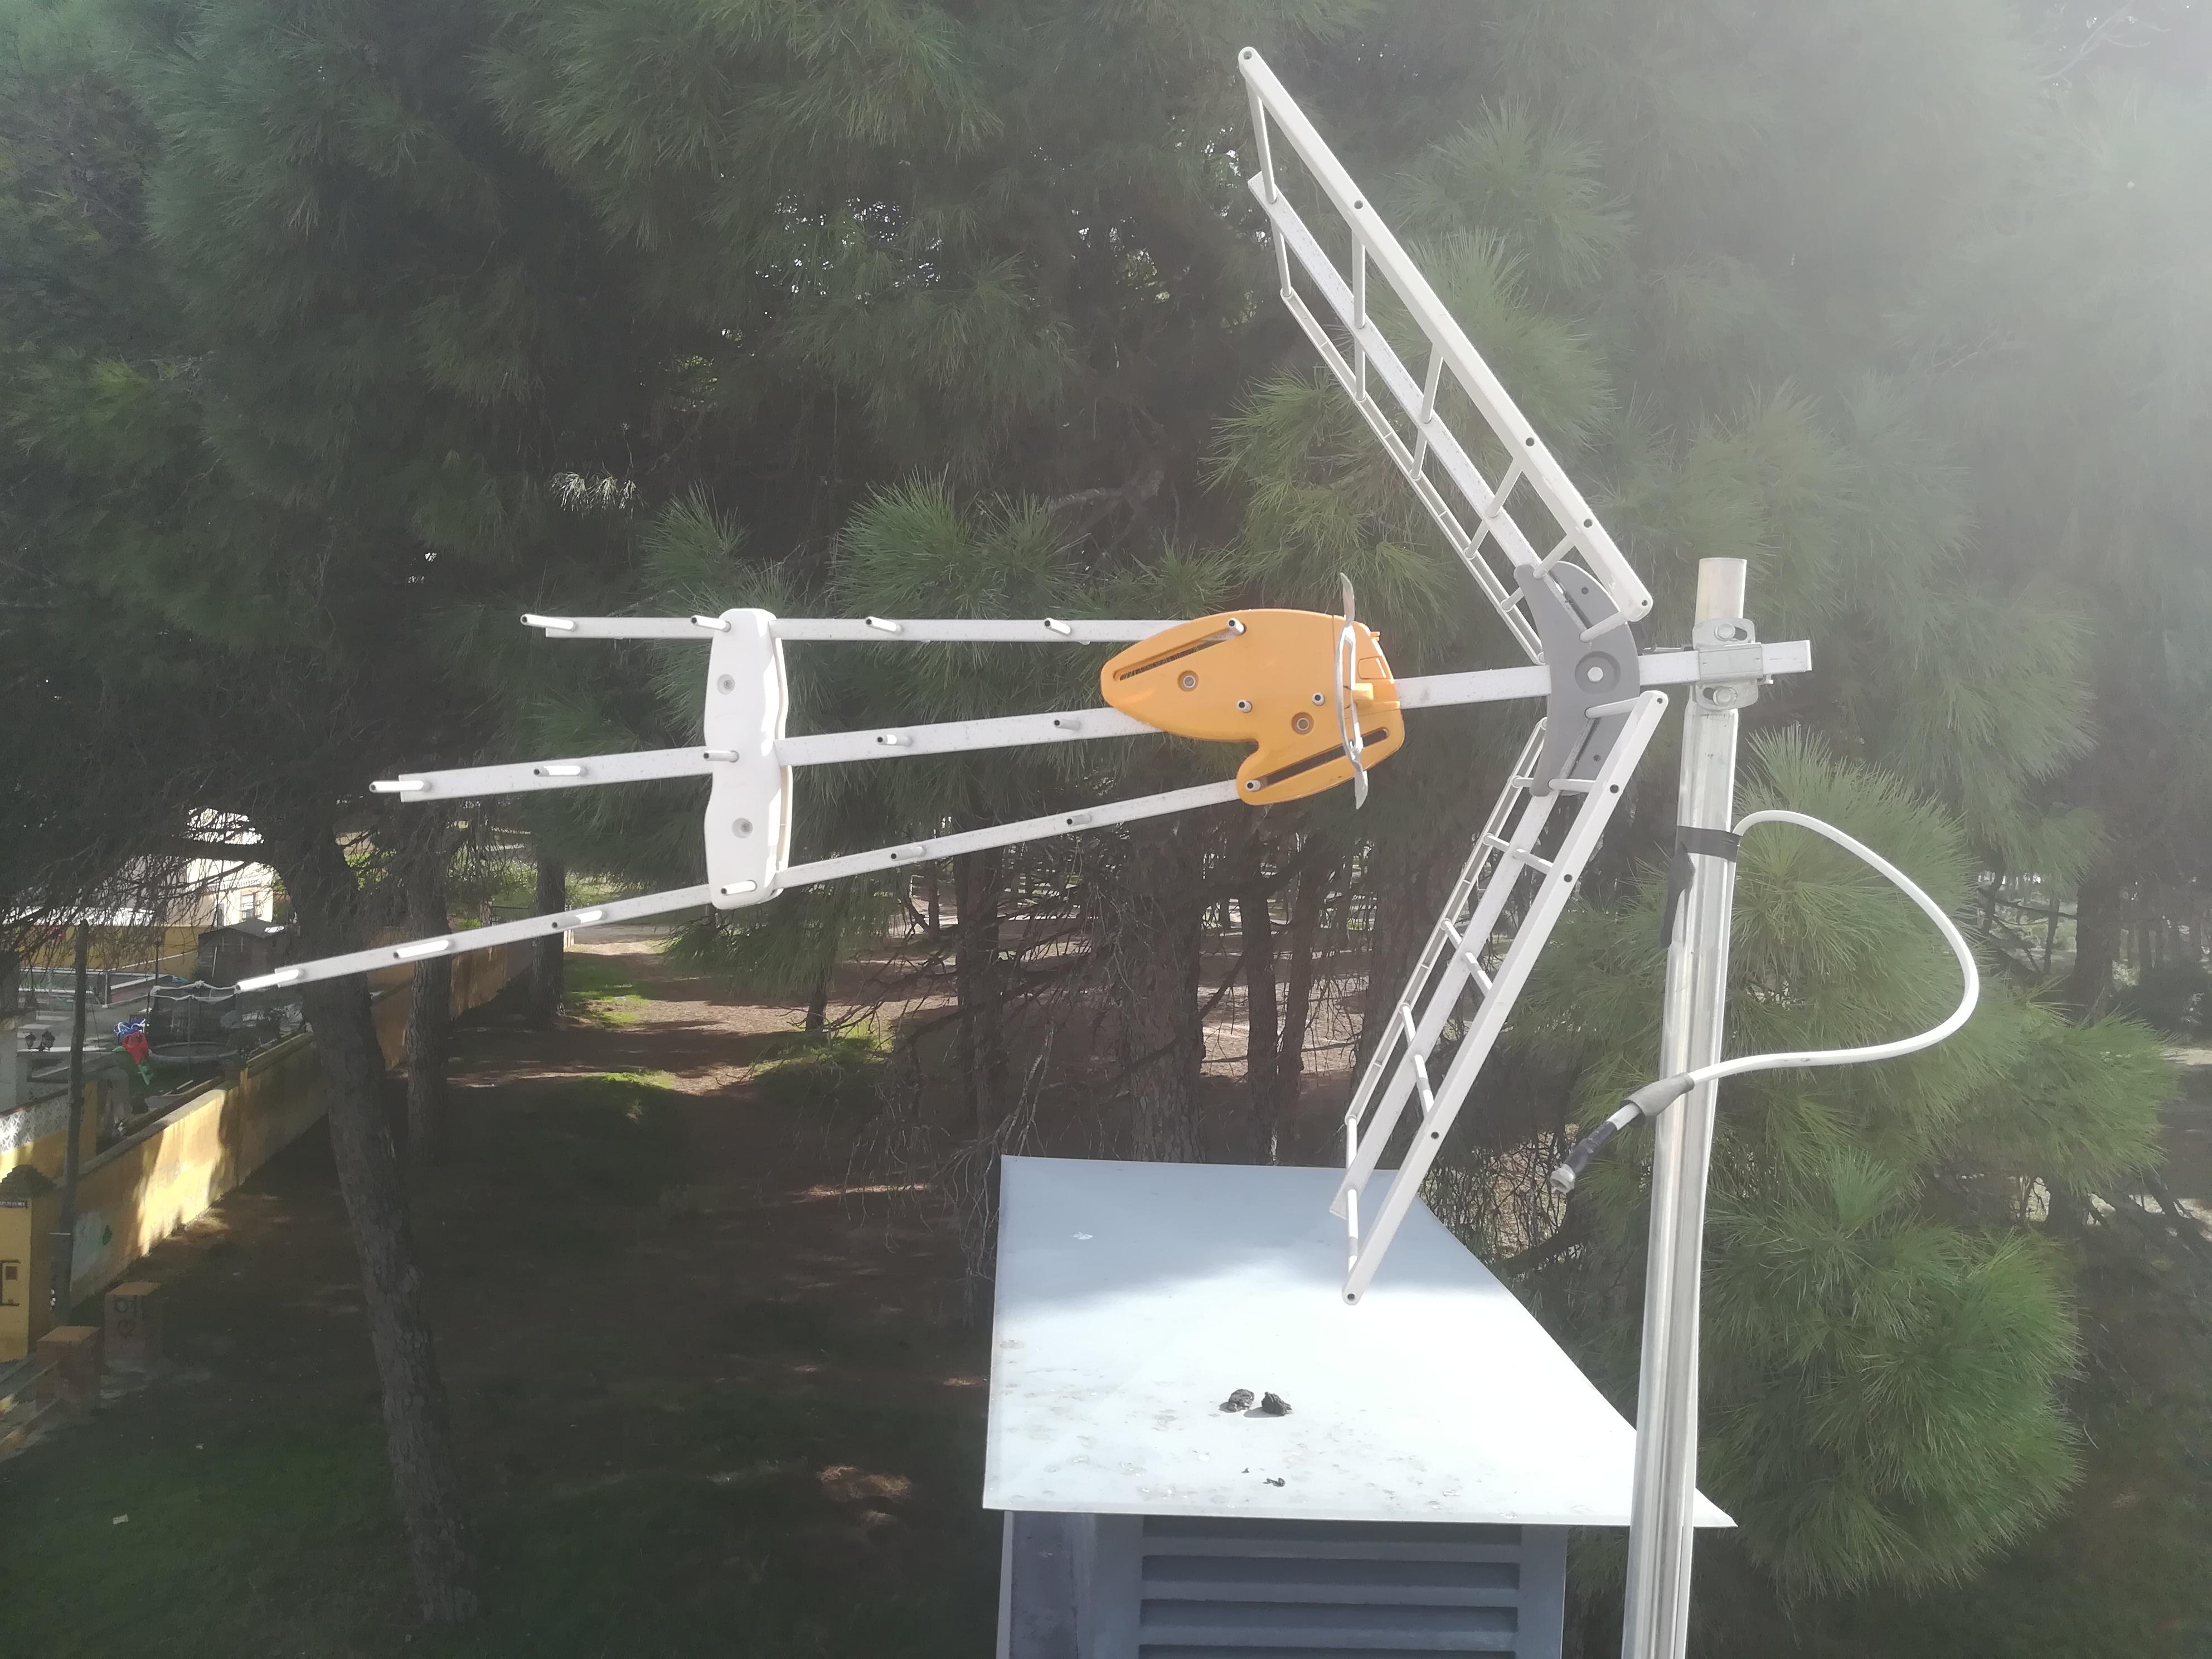 Antena mal montada